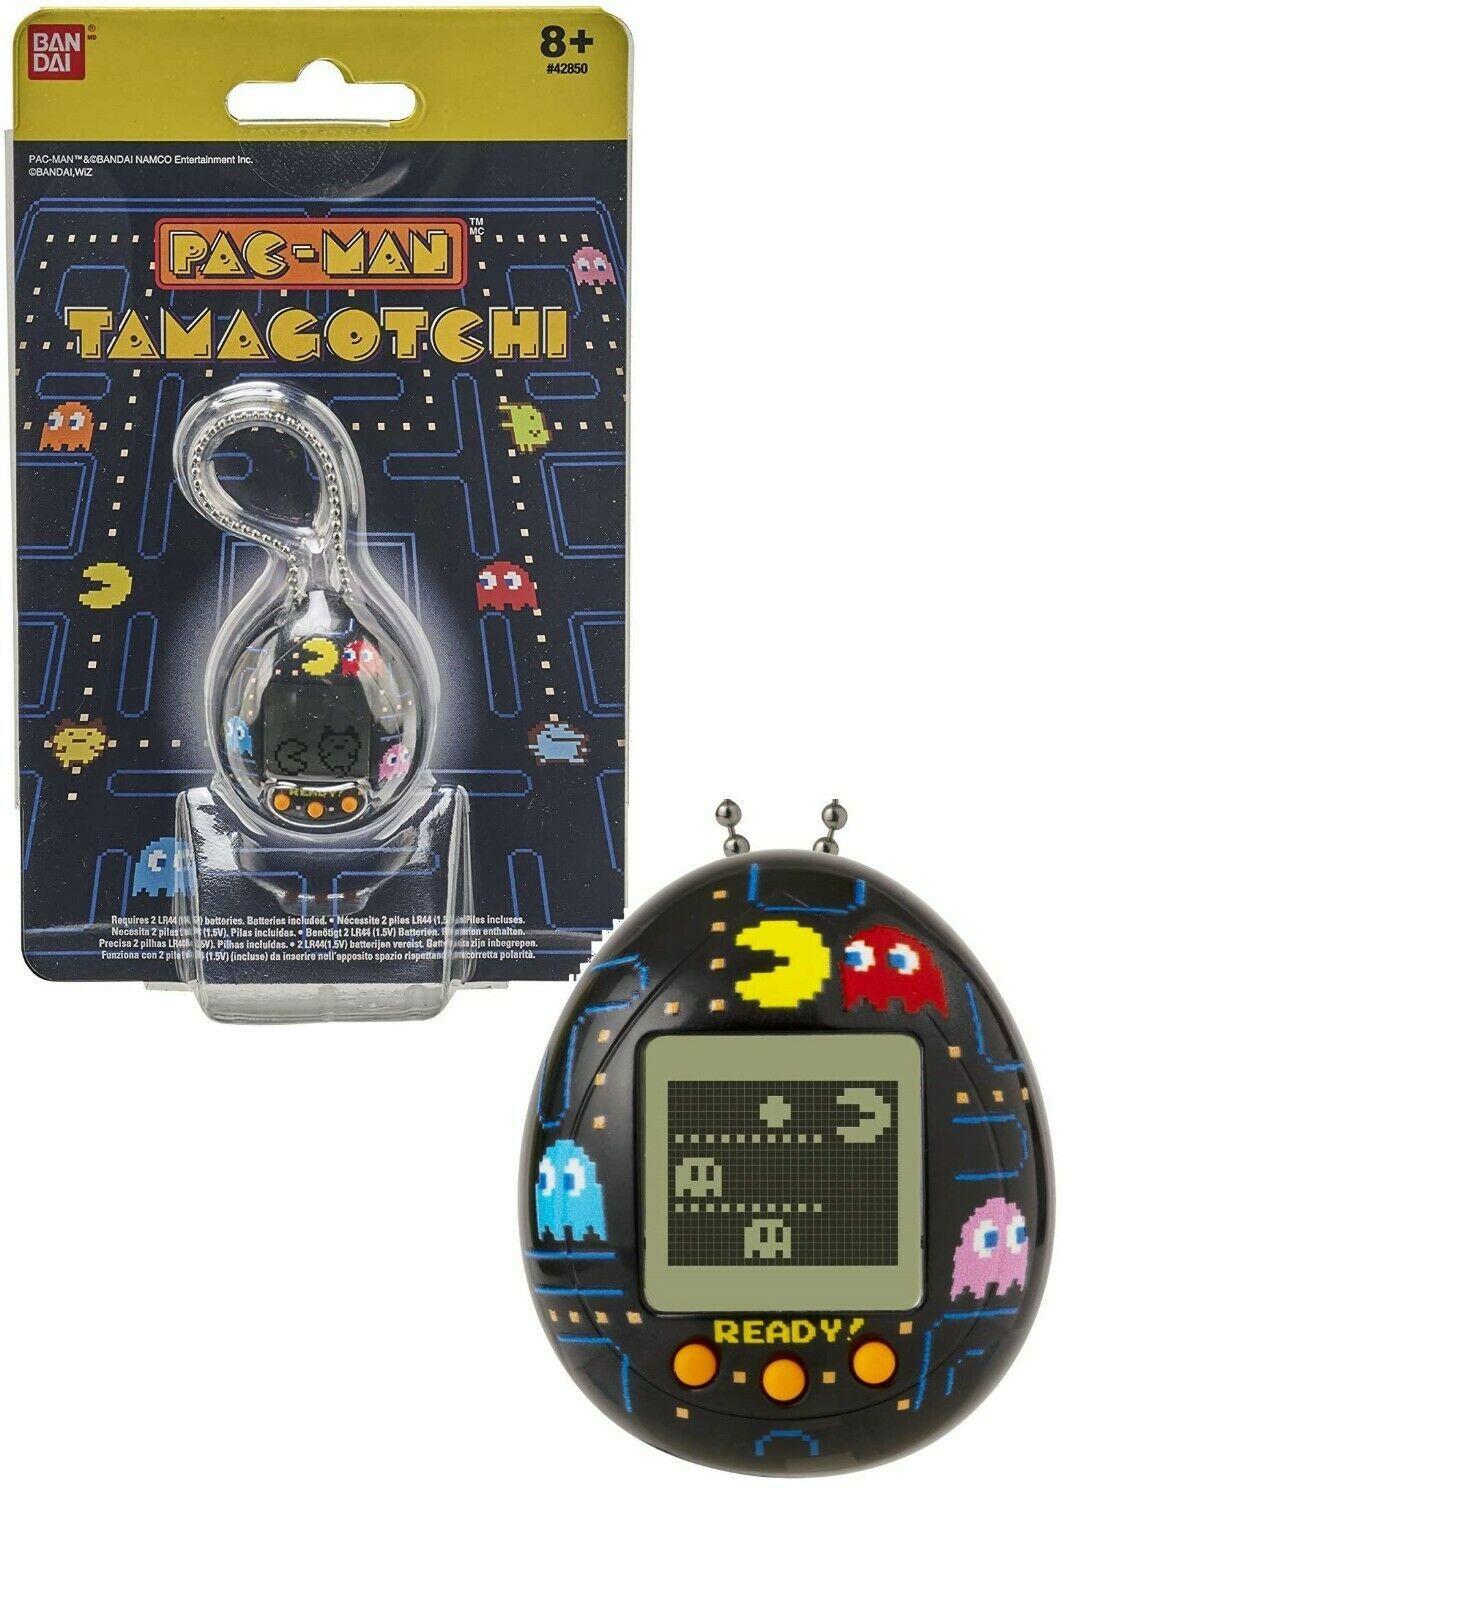 New Bandai Tamagotchi PAC-Man Edition - Black - $18.99